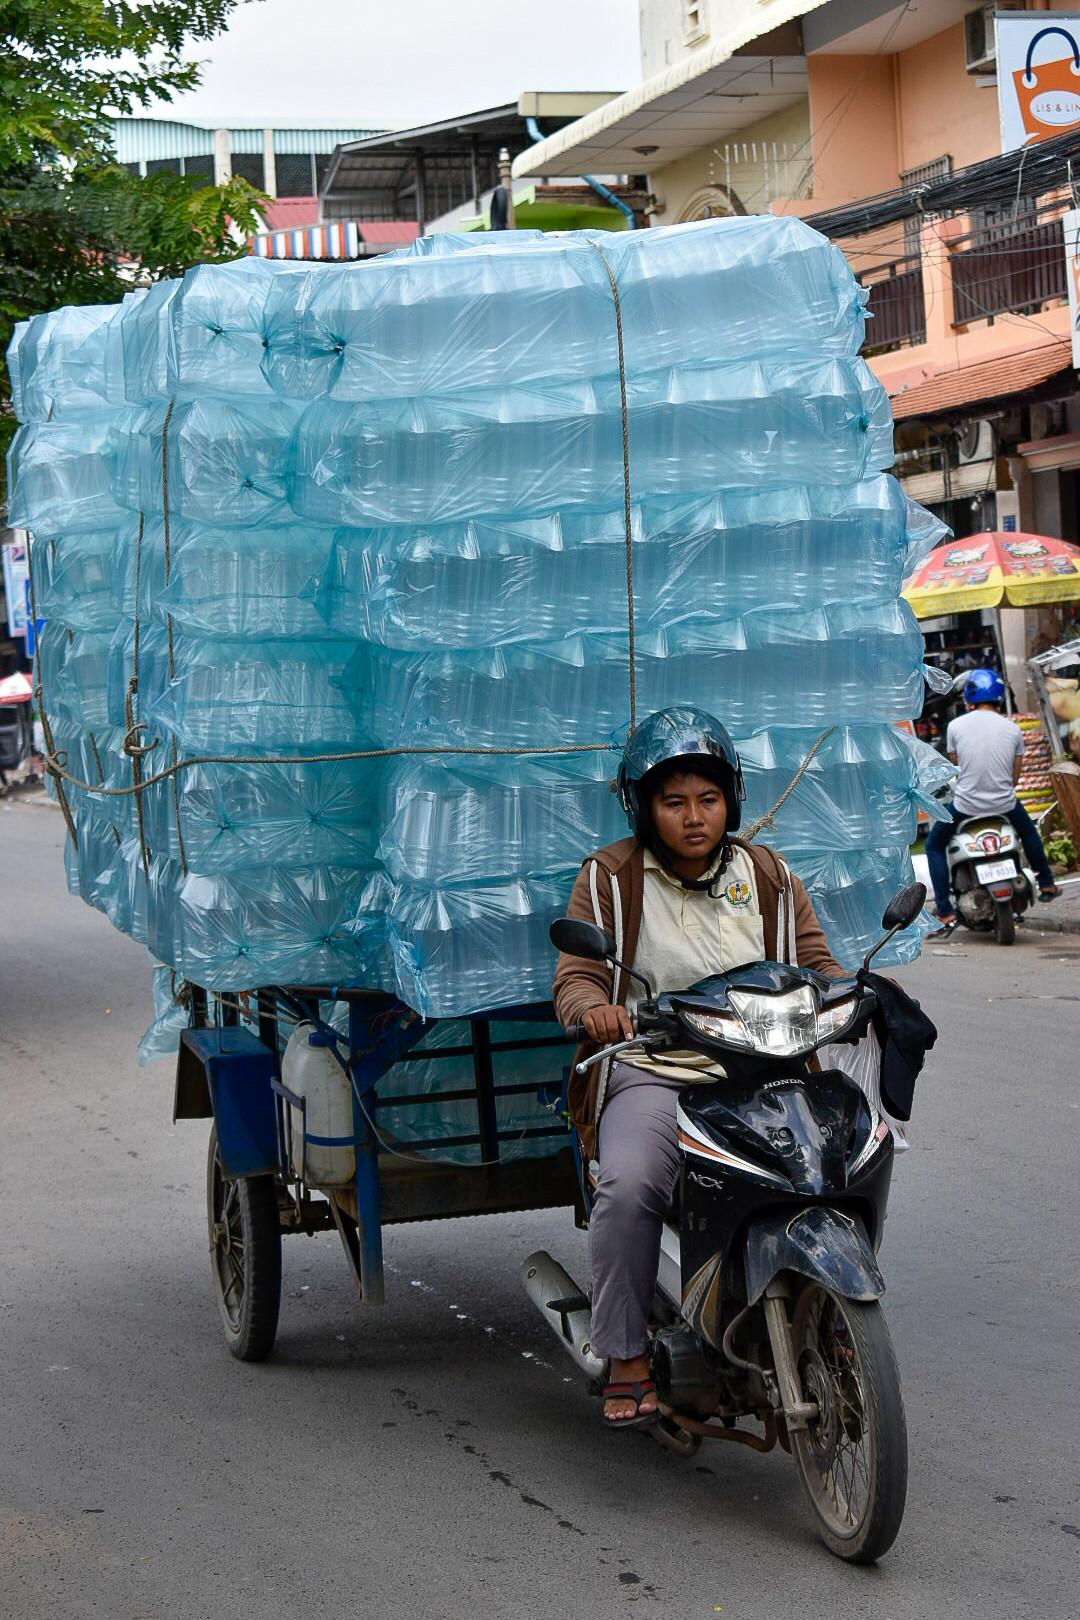 Phnom Penh plastics on motorbike